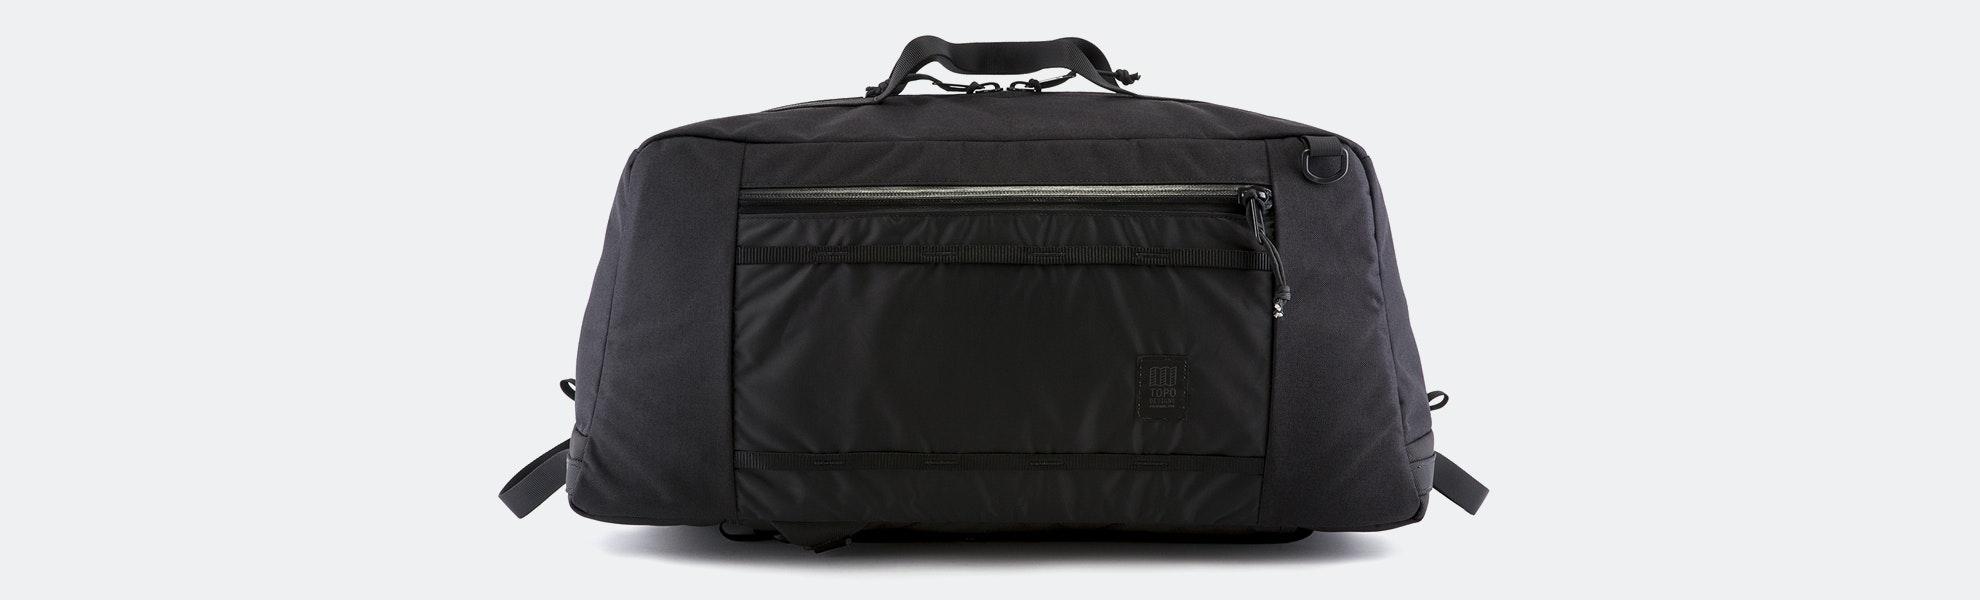 Topo Designs Mountain Duffel Bag